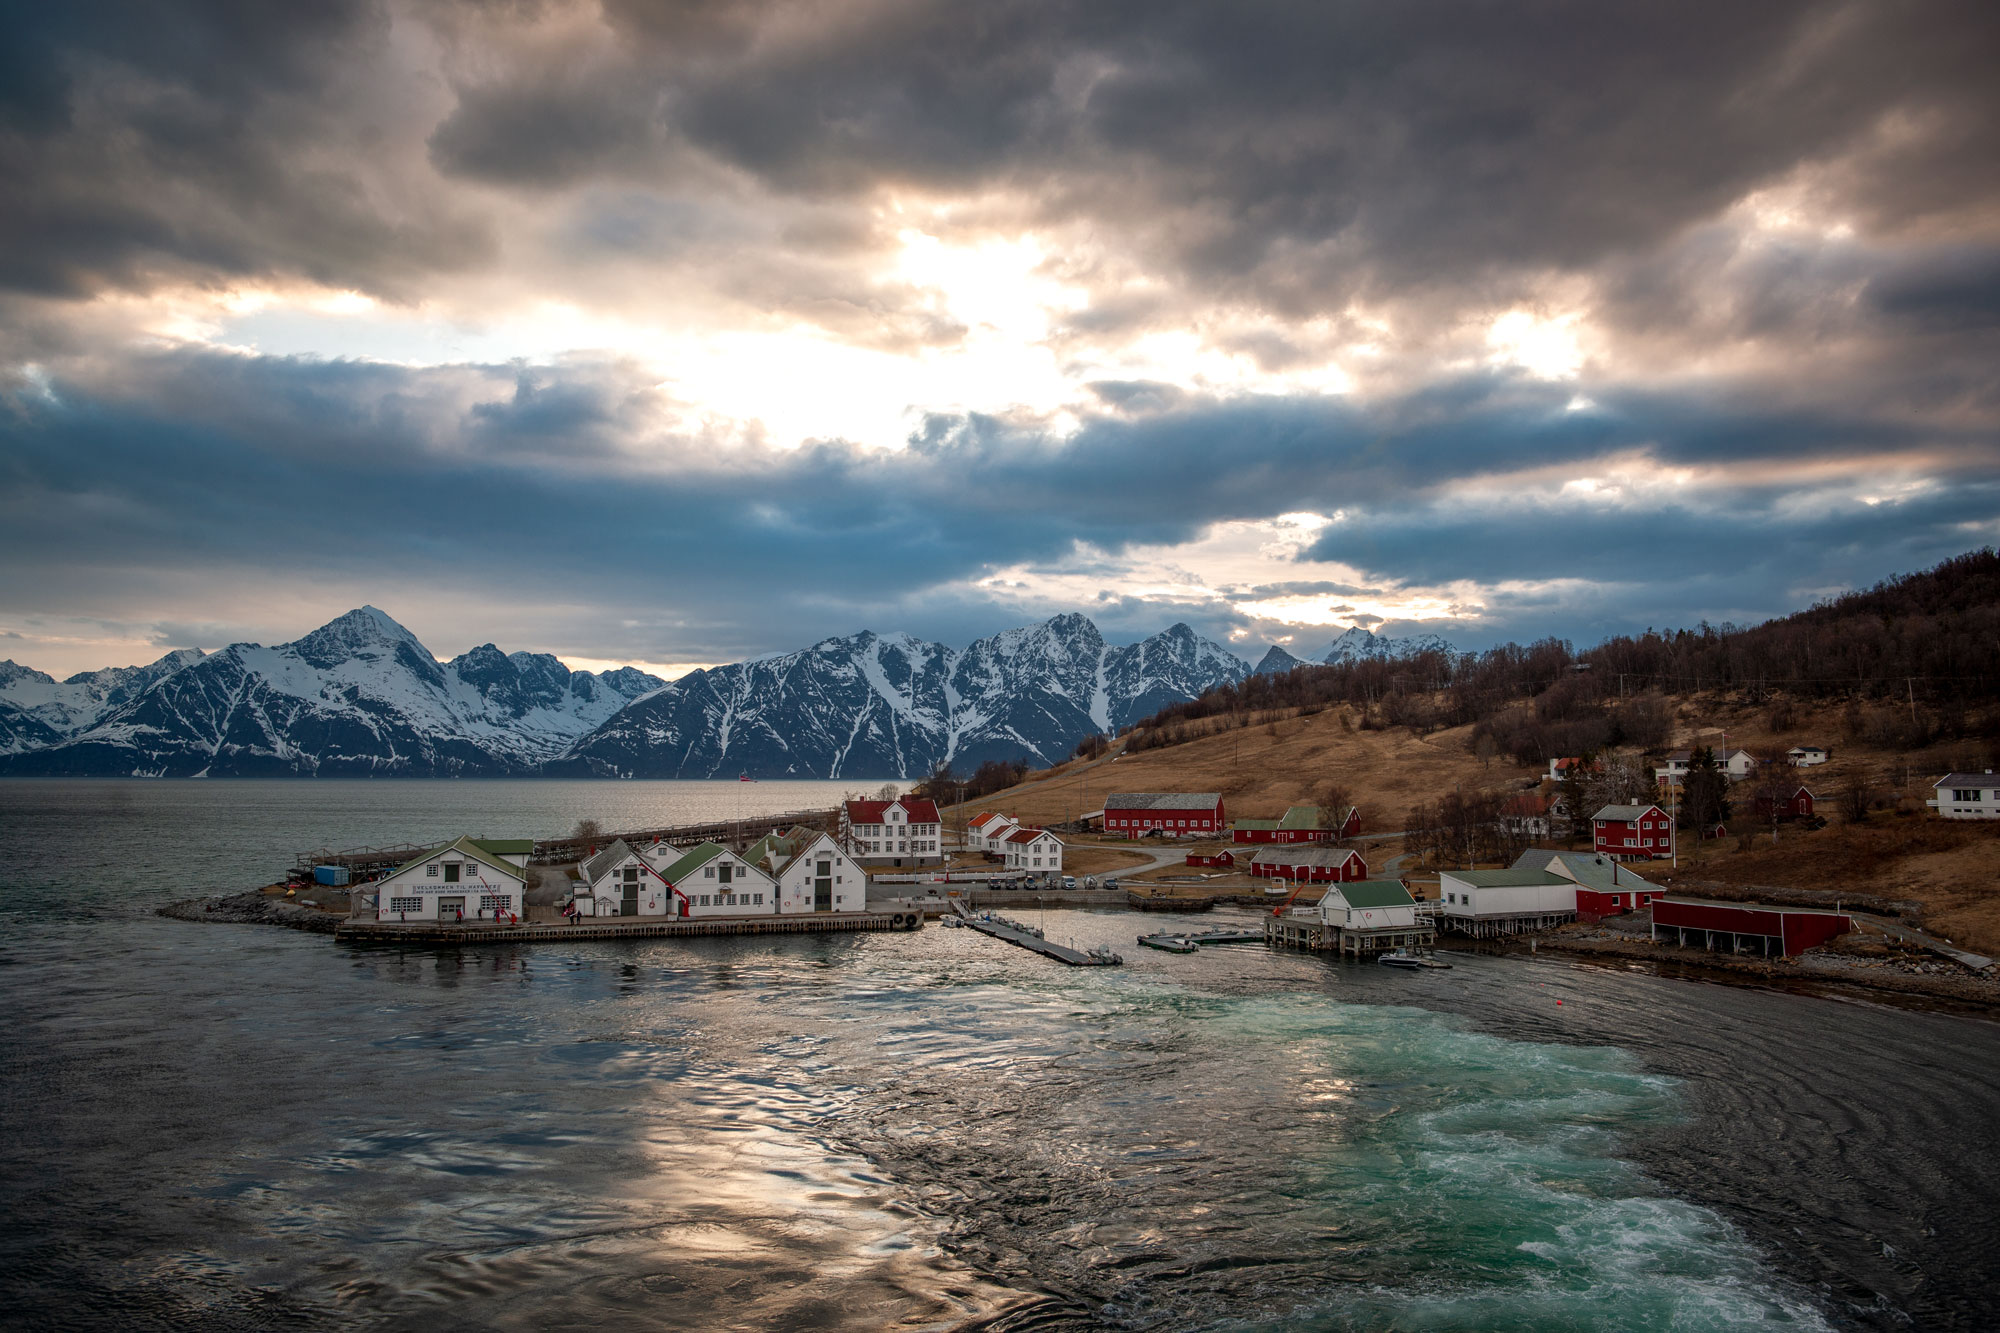 Havnnes, Troms